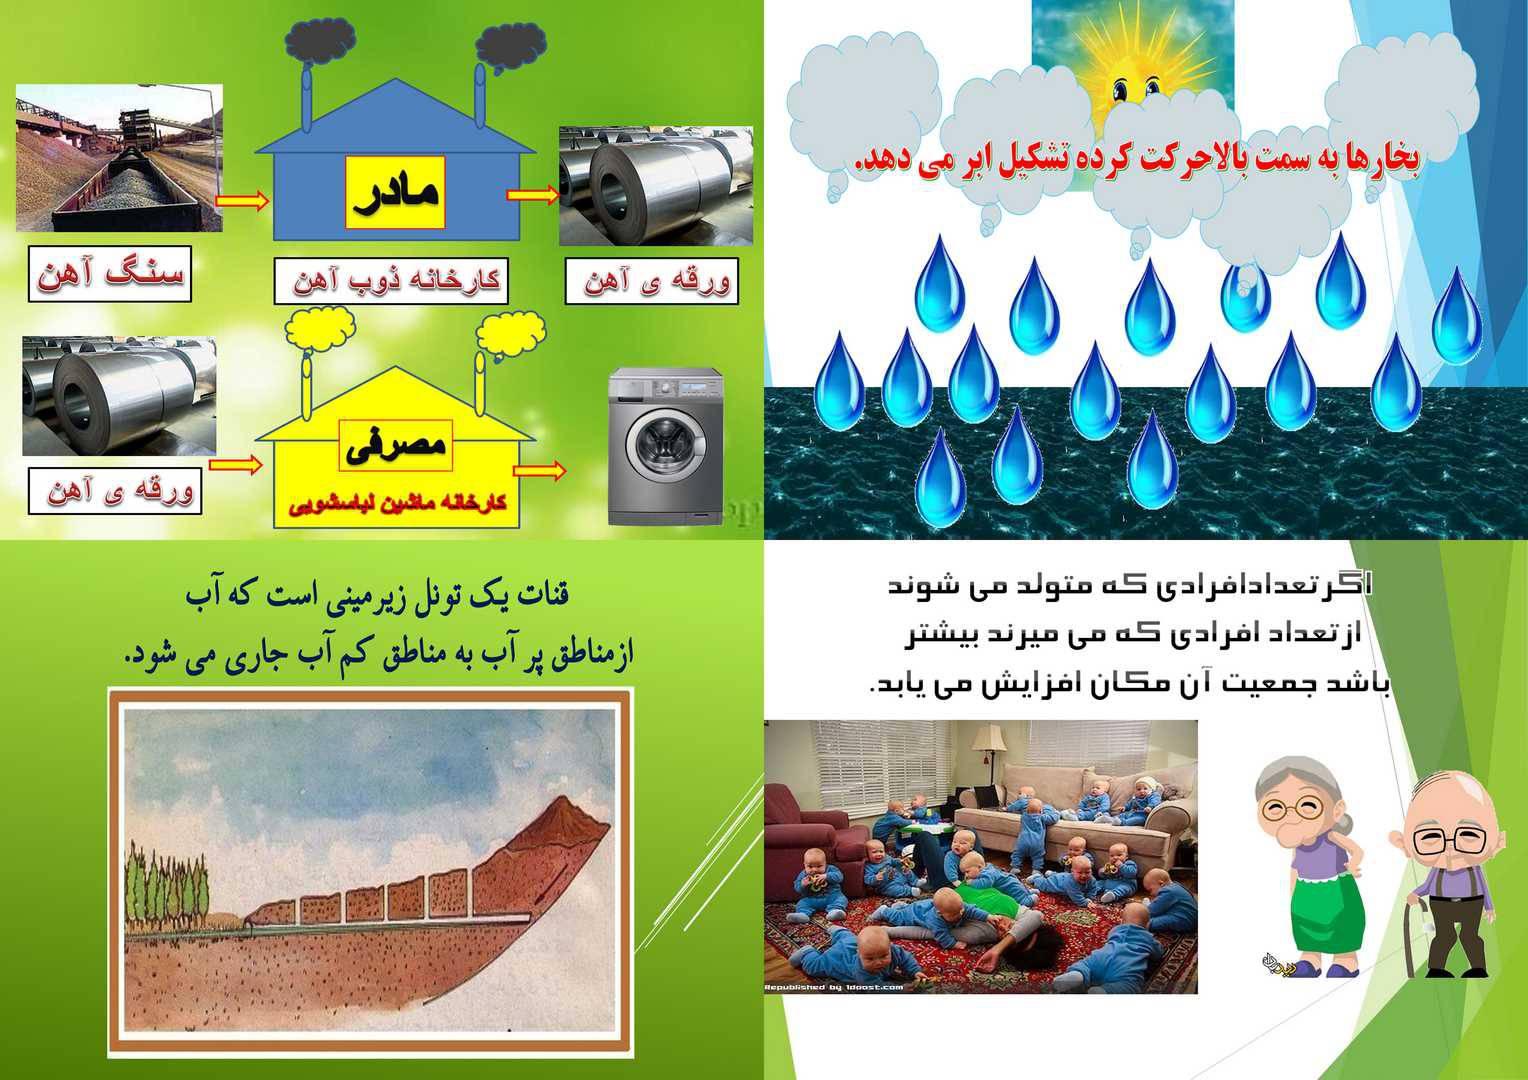 مجموعه پاورپوینت اجتماعی پنجم(جمعیت،تشکیل رود،منابع آب،صنعت)